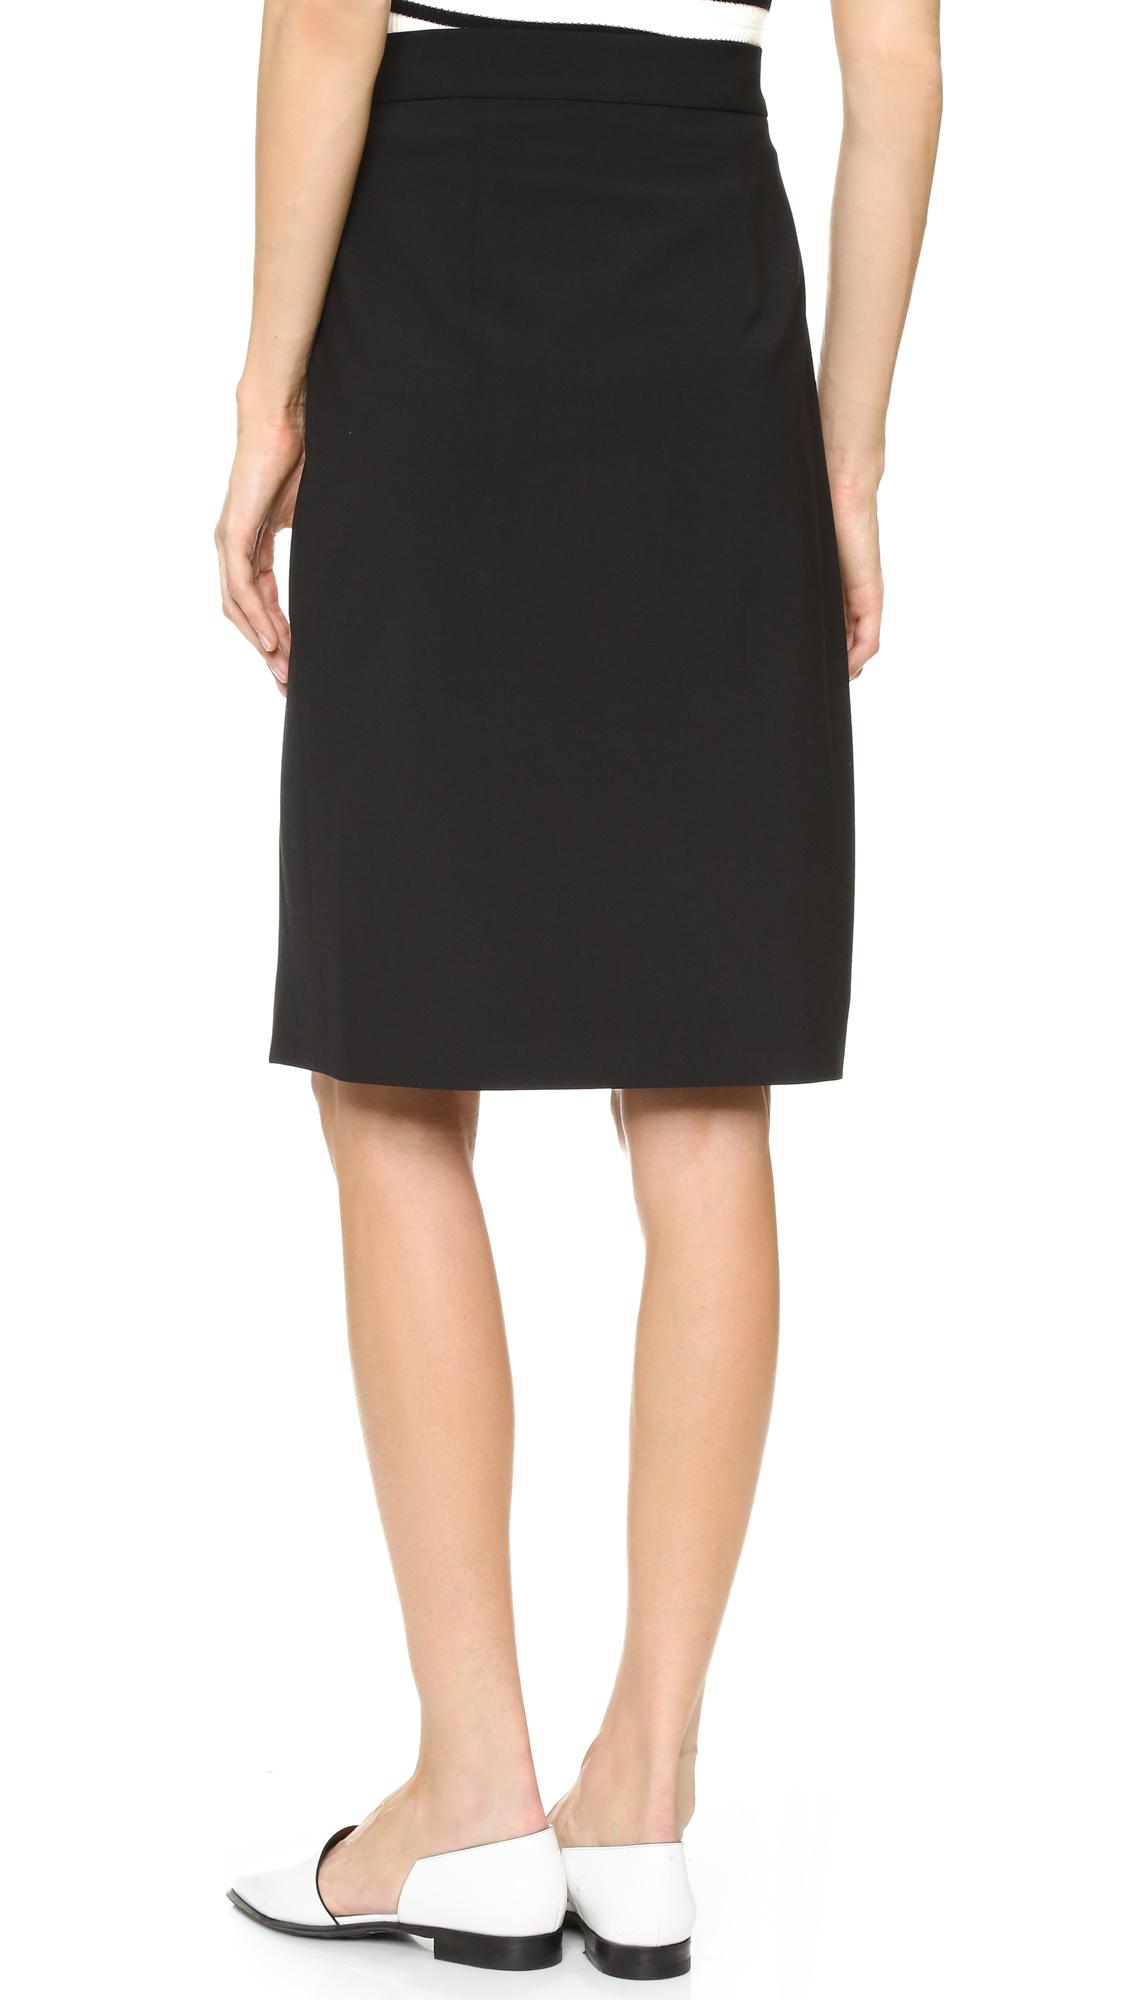 dkny asymmetrical pencil skirt in black lyst